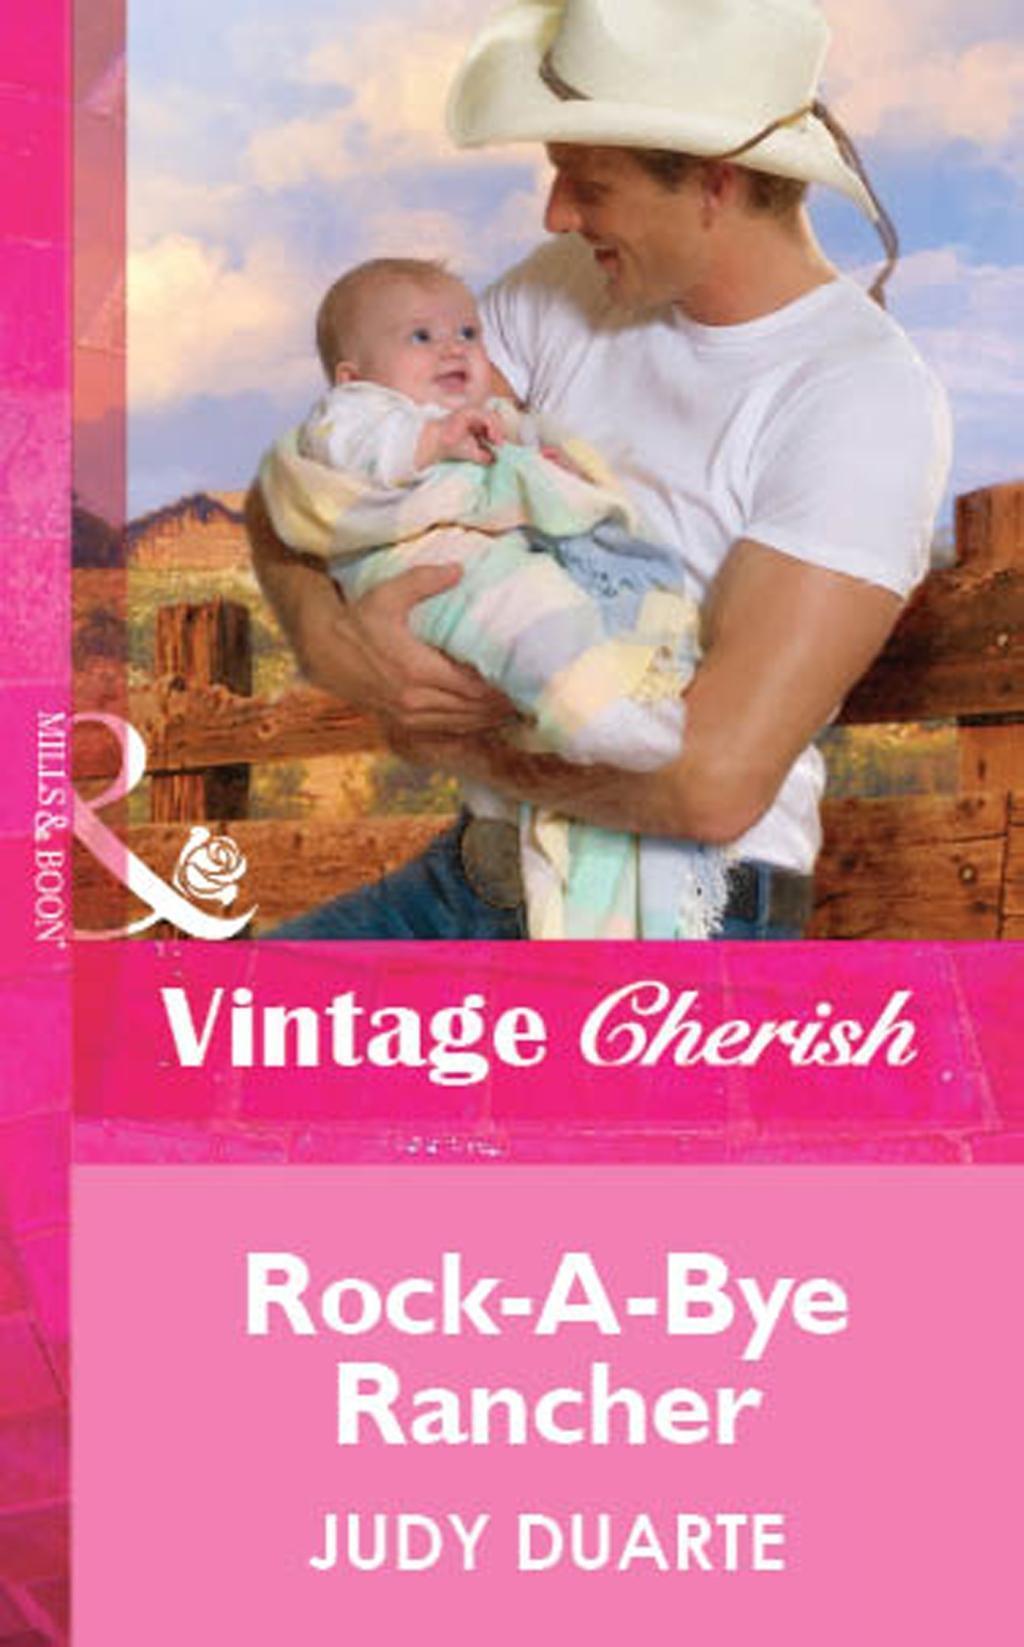 Rock-A-Bye Rancher (Mills & Boon Vintage Cherish)